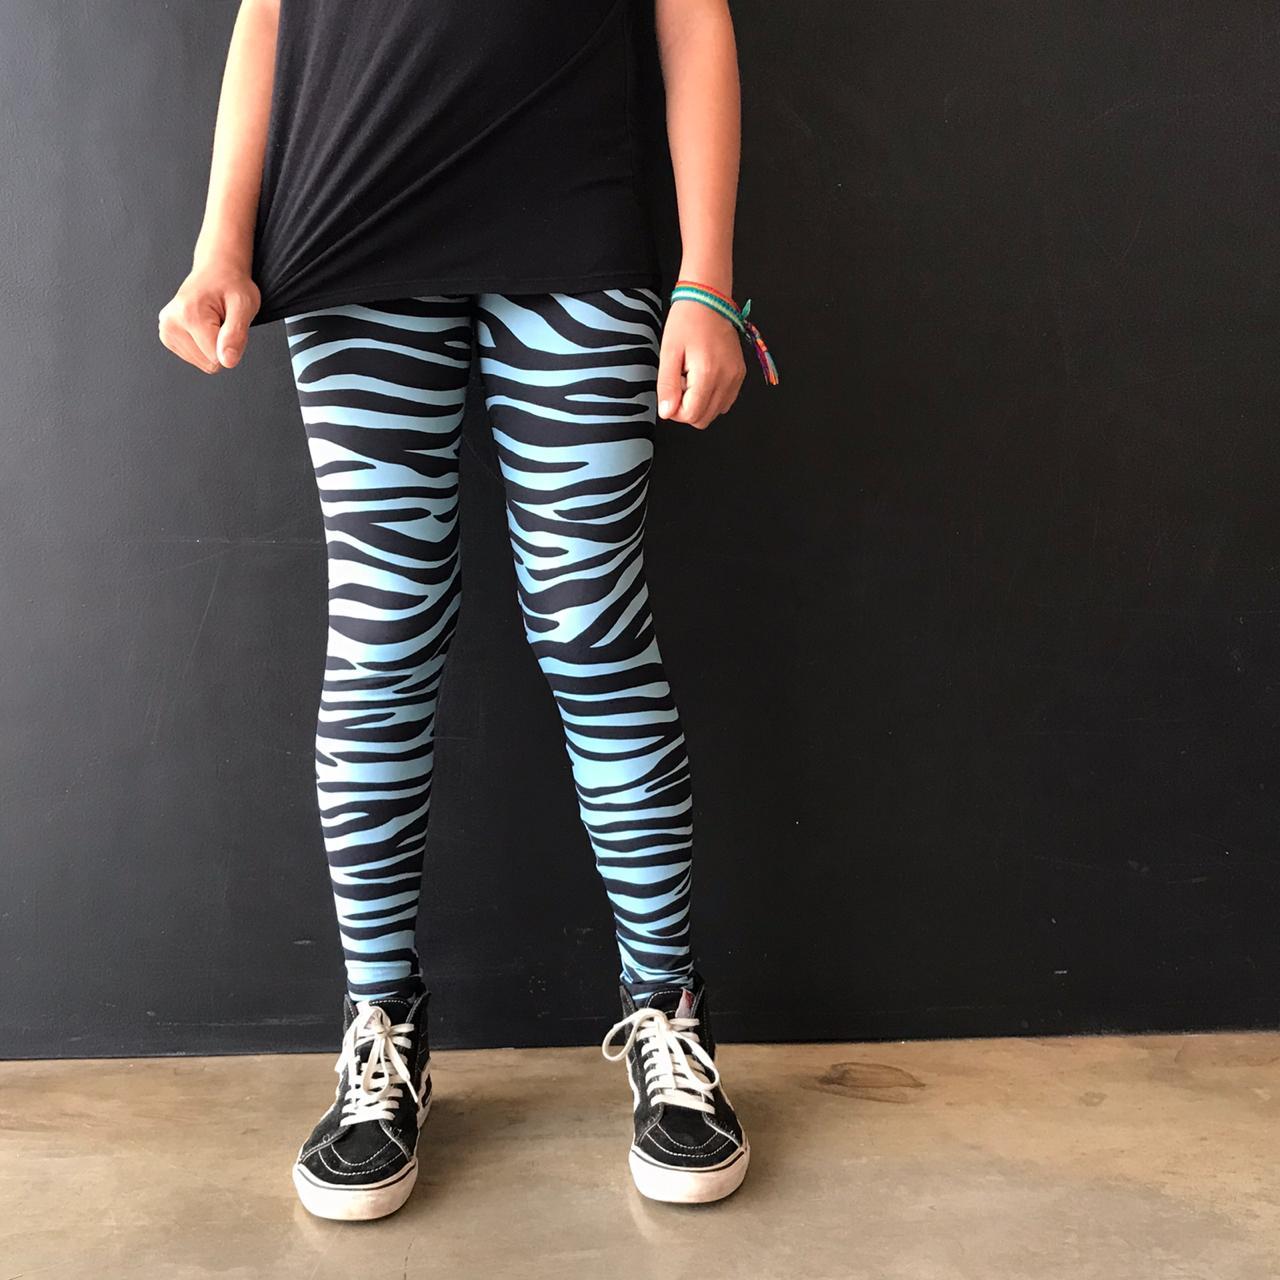 Calça Legging Adulto Cintura Alta Estampada Zebra